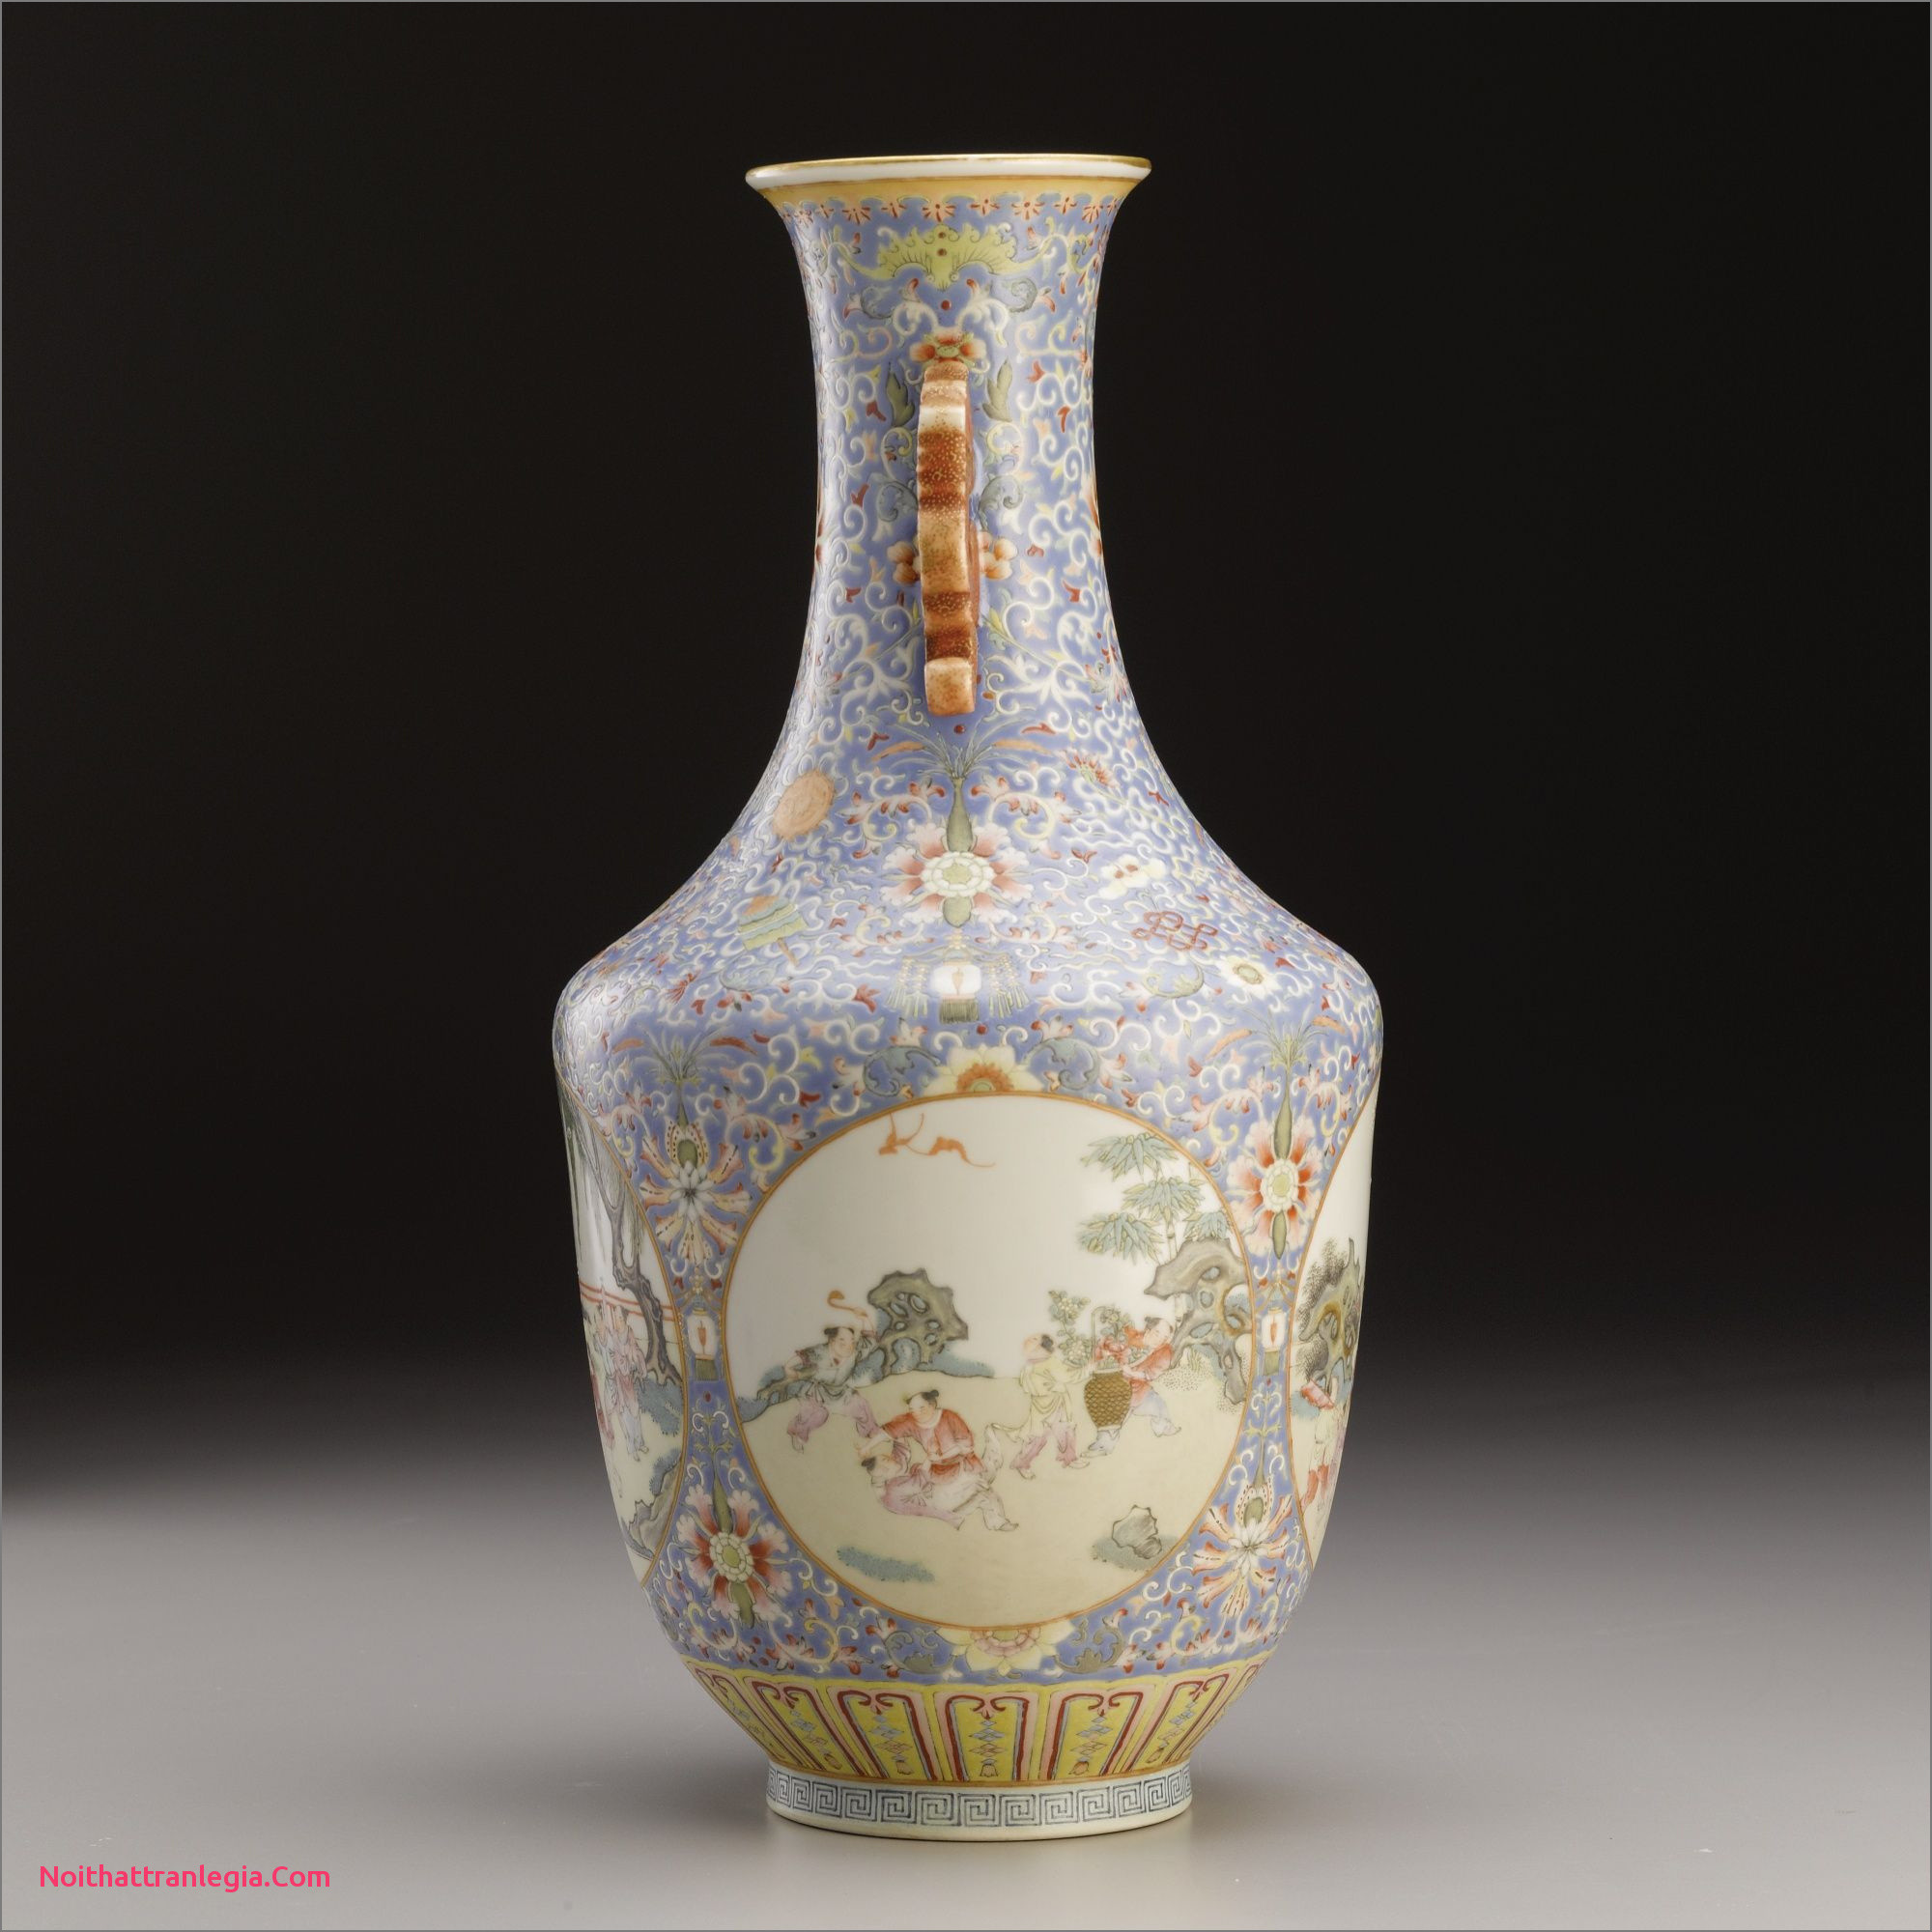 cobalt blue vases bulk of 20 chinese antique vase noithattranlegia vases design within a fine blue ground famille rose vase qing dynasty daoguang